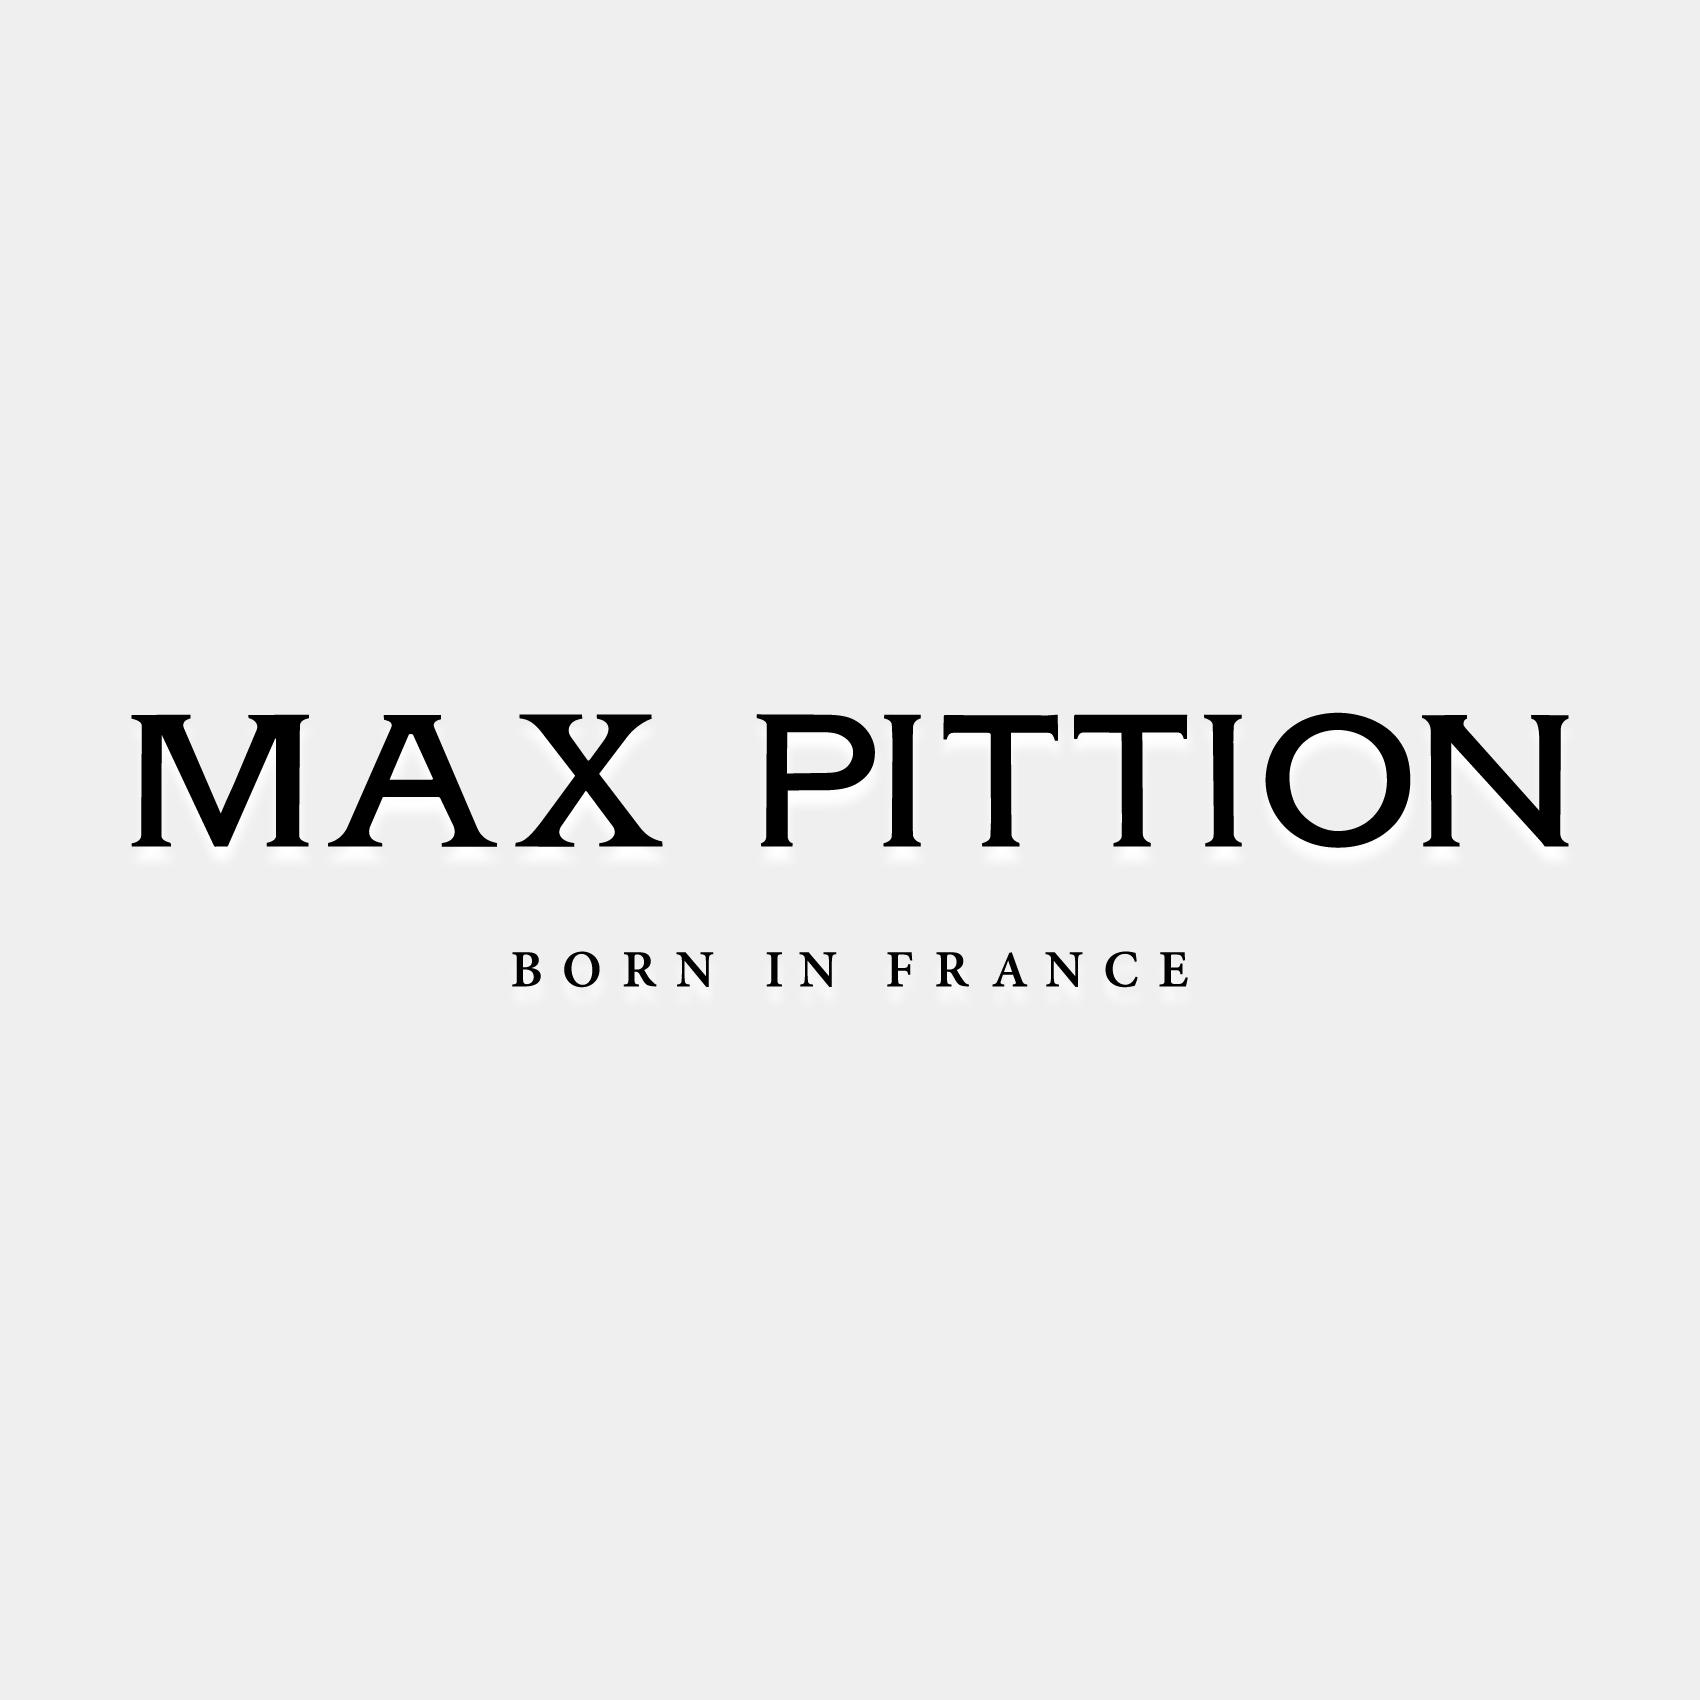 max-pittion-160308